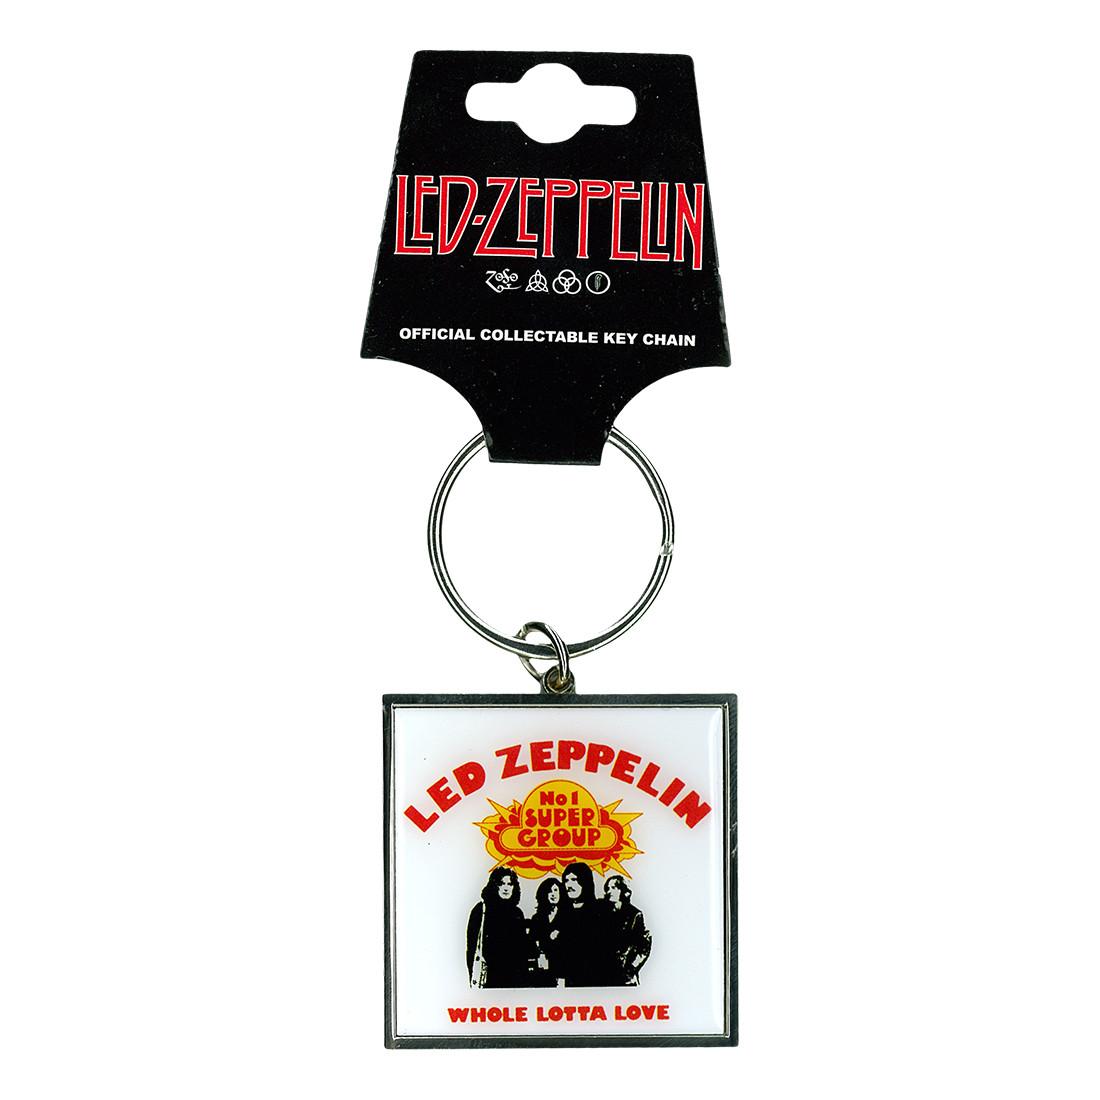 Led Zep Whole Lotta Love Keychain